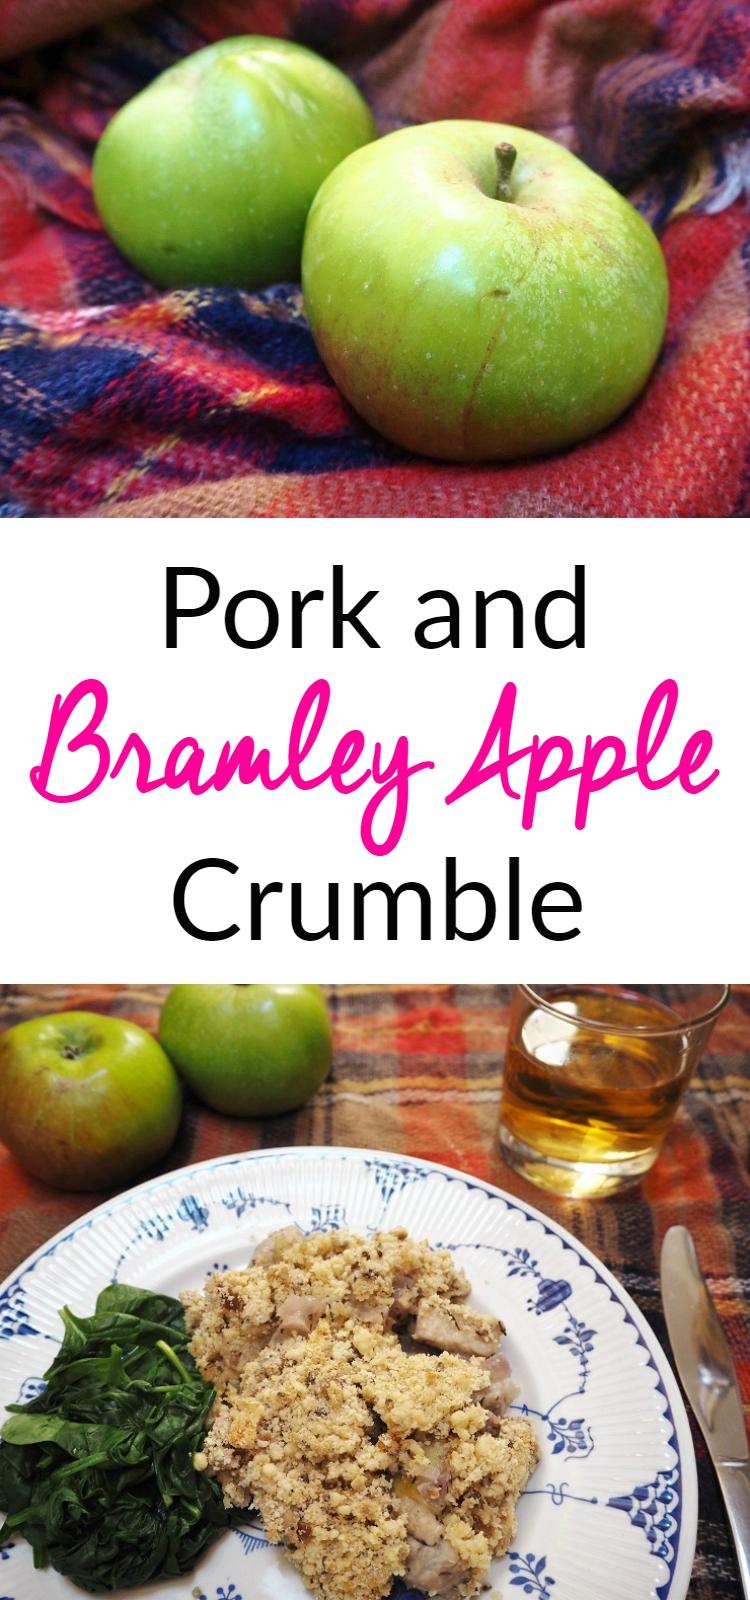 pork and bramley apple crumble